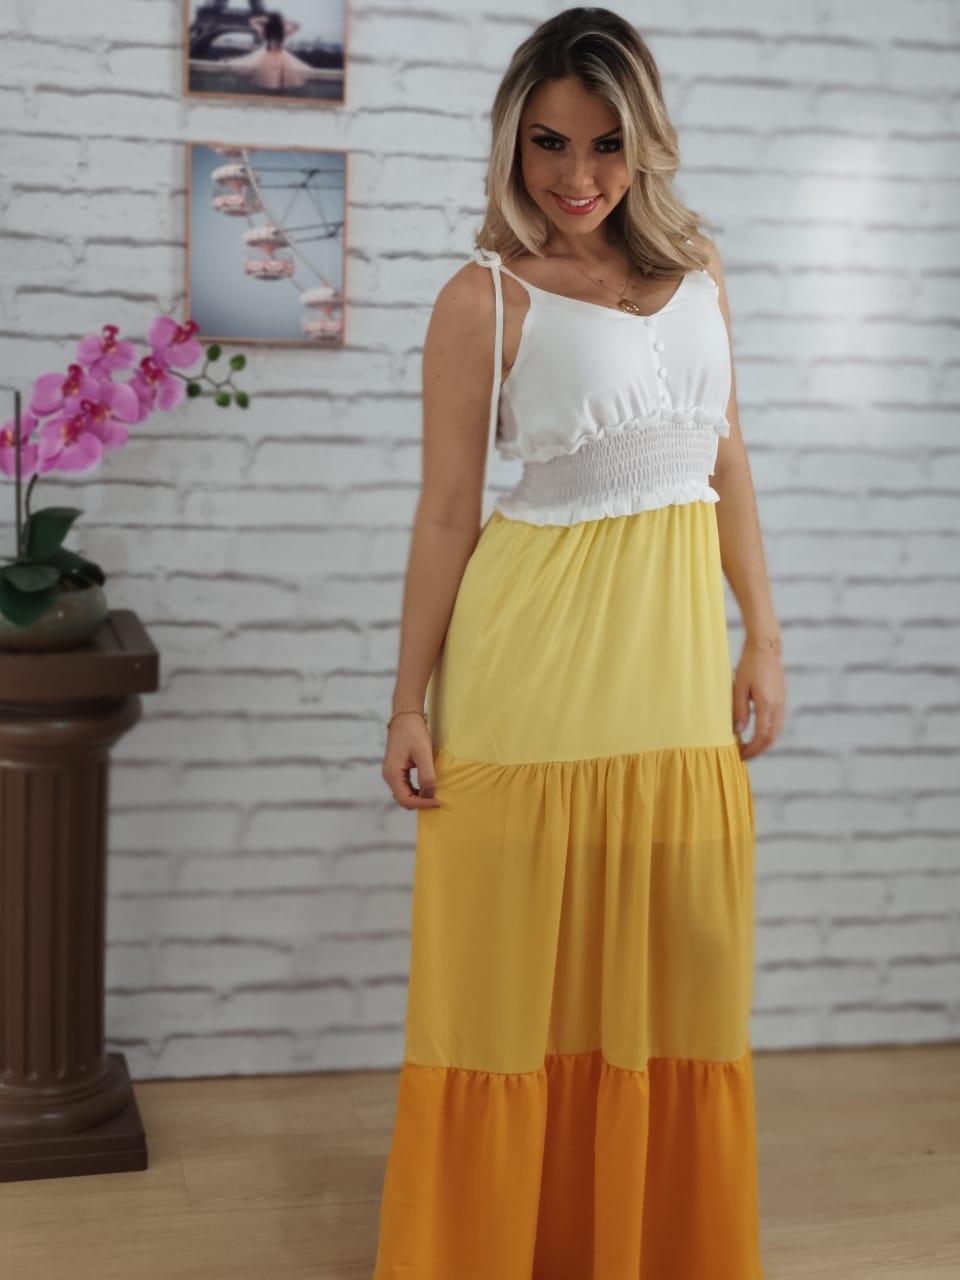 Vestido Longo Laço Alça Tricolor Amarelo